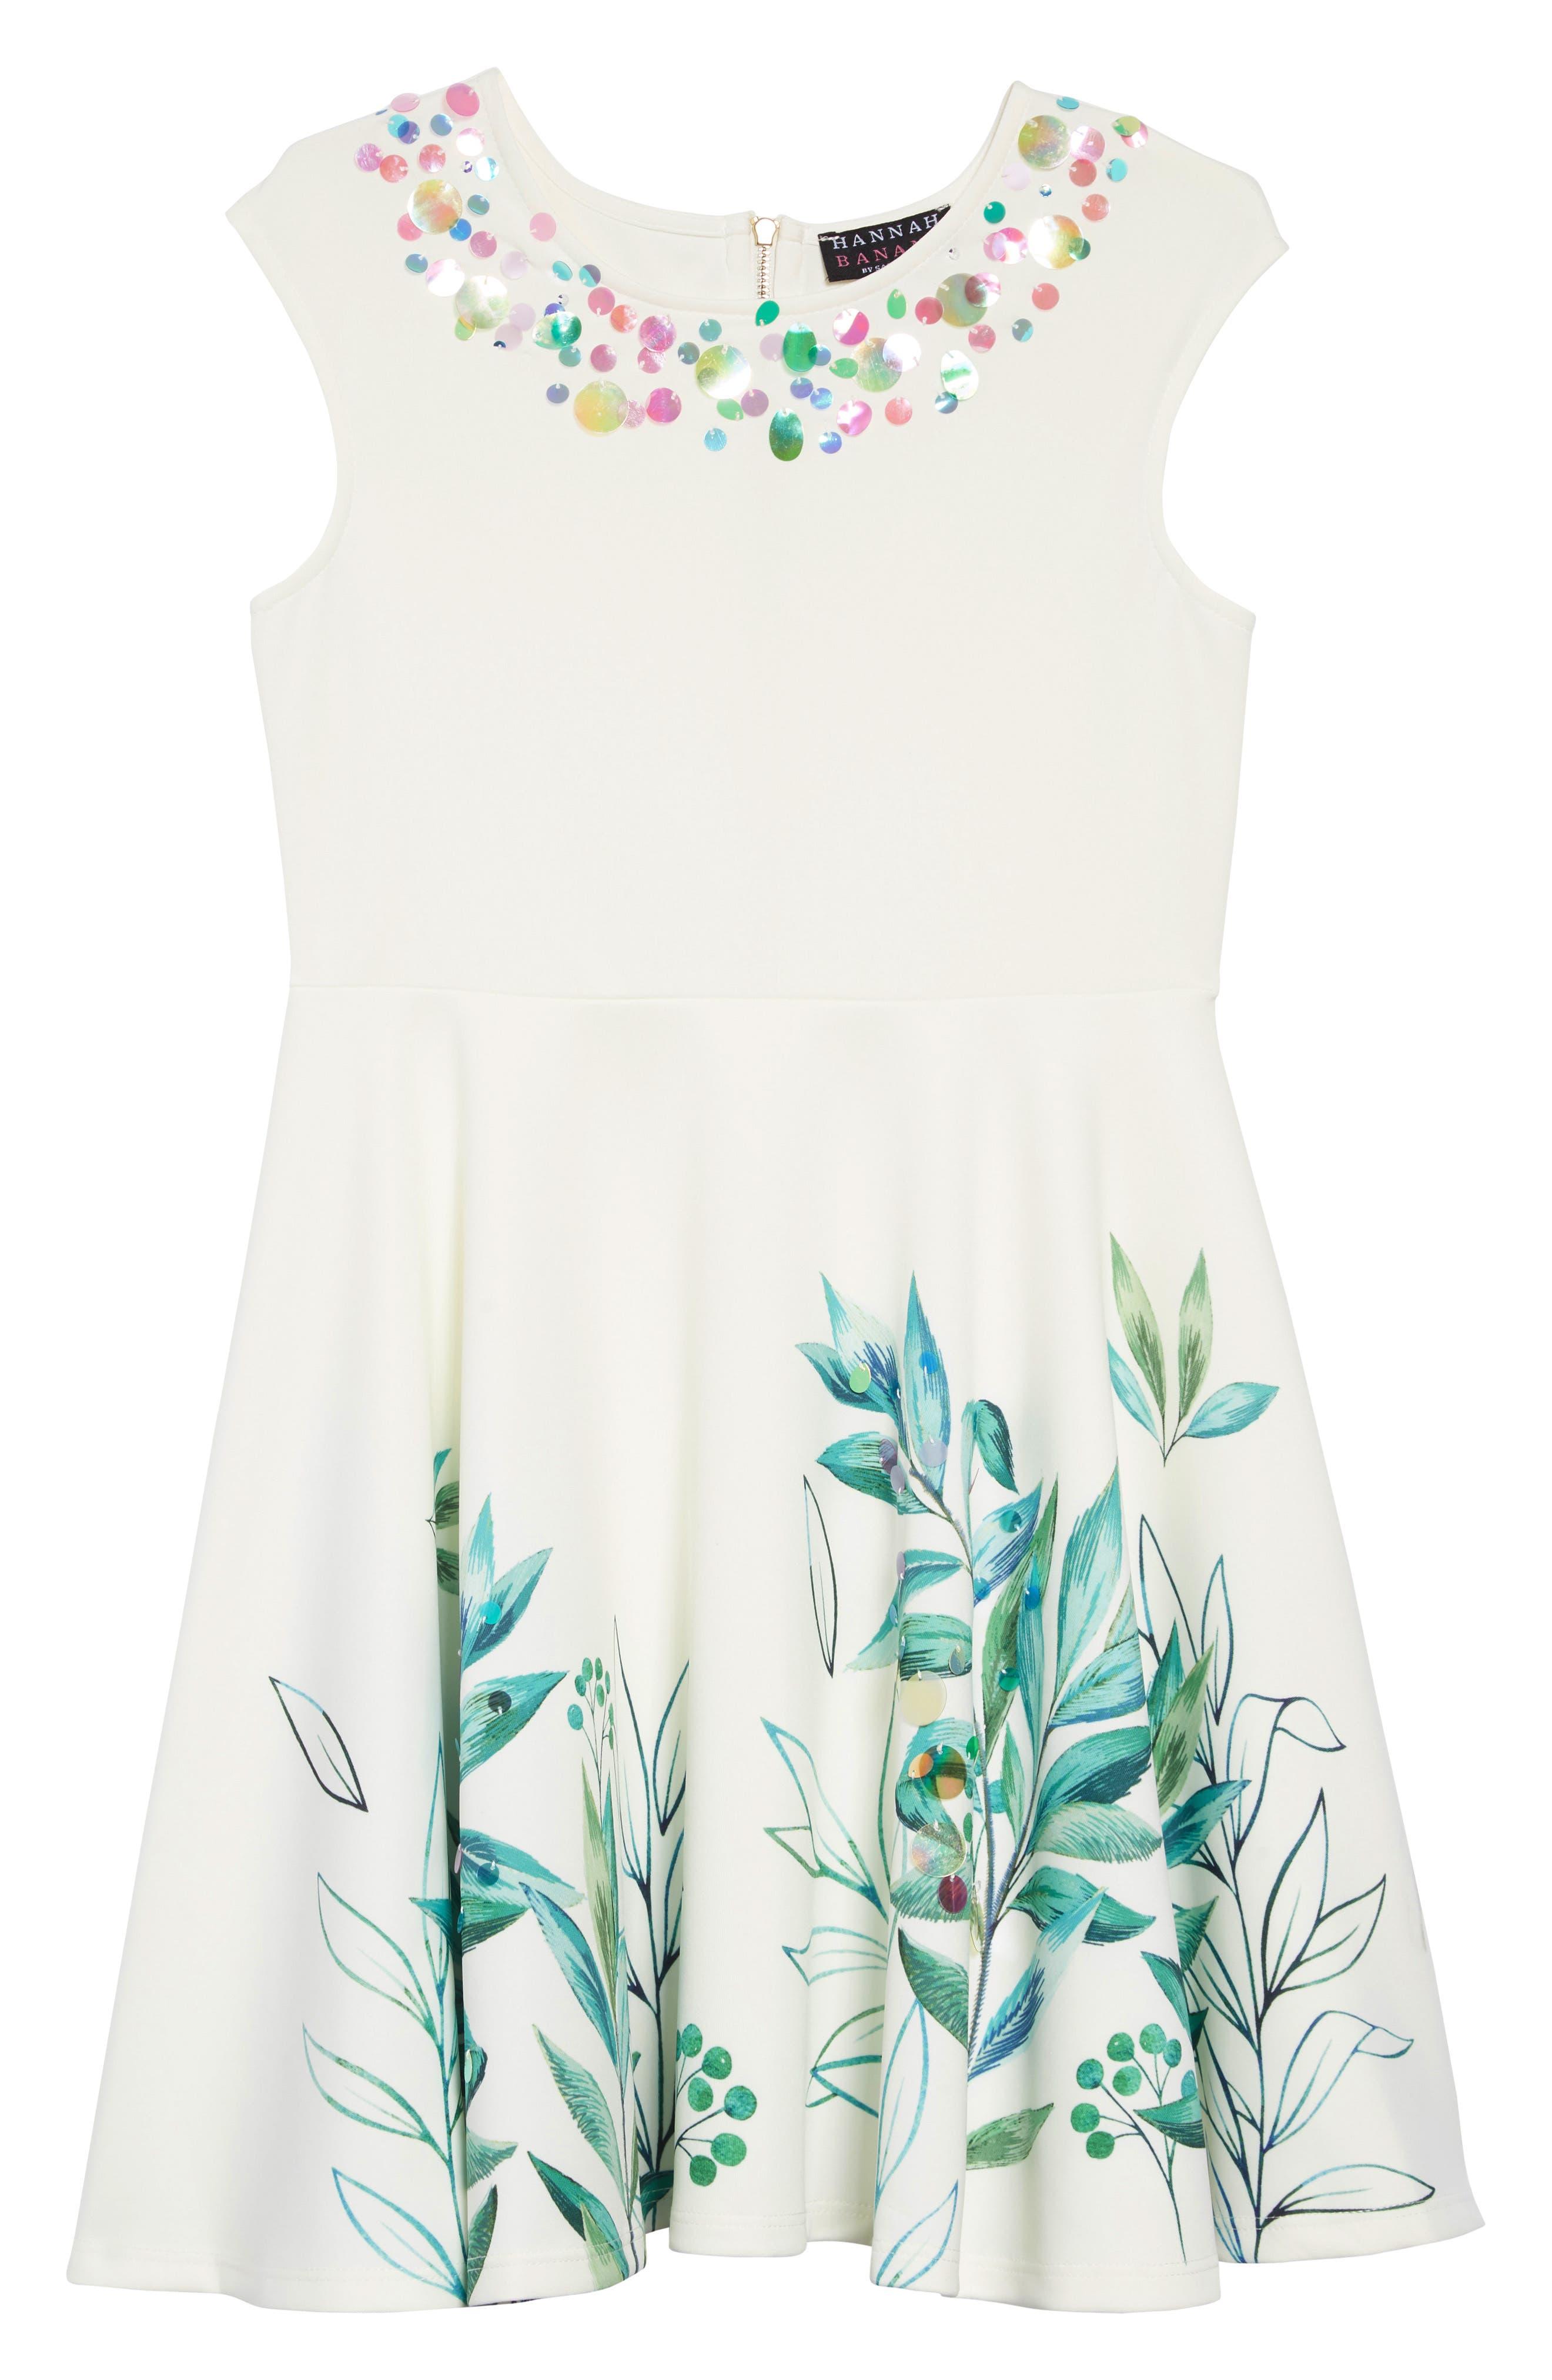 HANNAH BANANA, Leafy Print Embellished Dress, Main thumbnail 1, color, 100